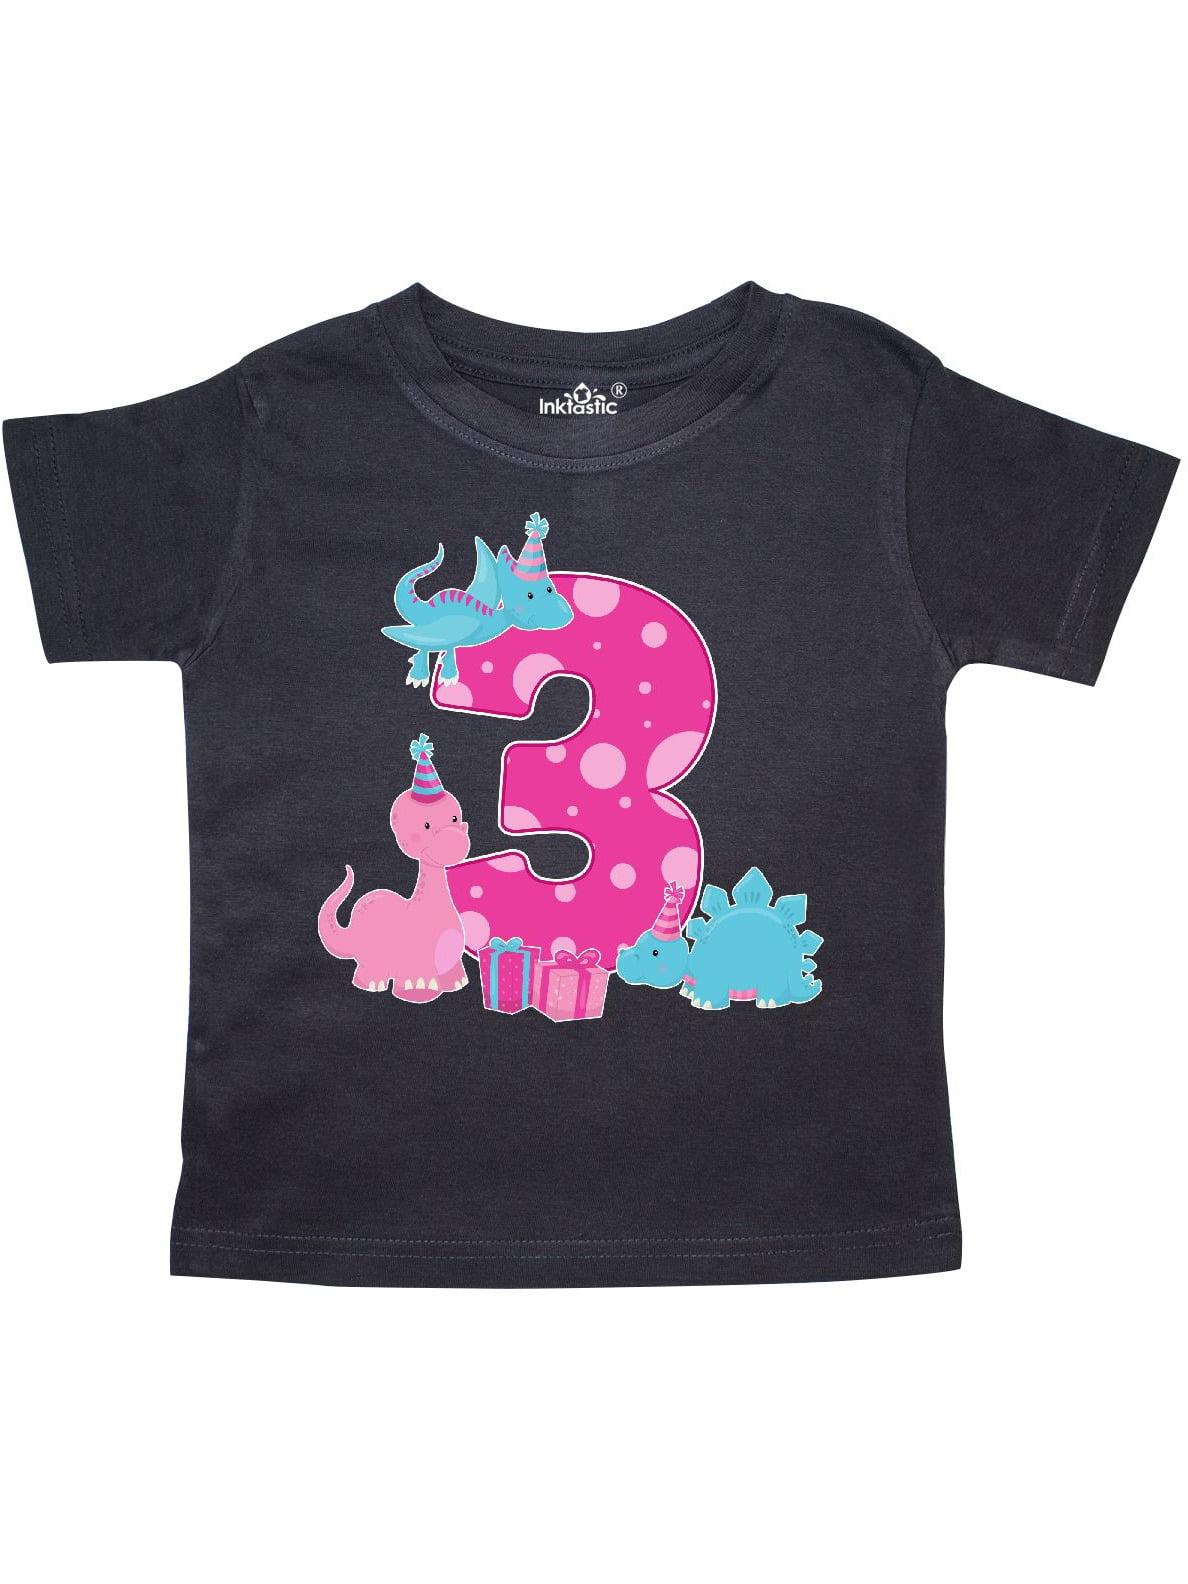 Dinosaur party-Third Birthday Toddler T-Shirt